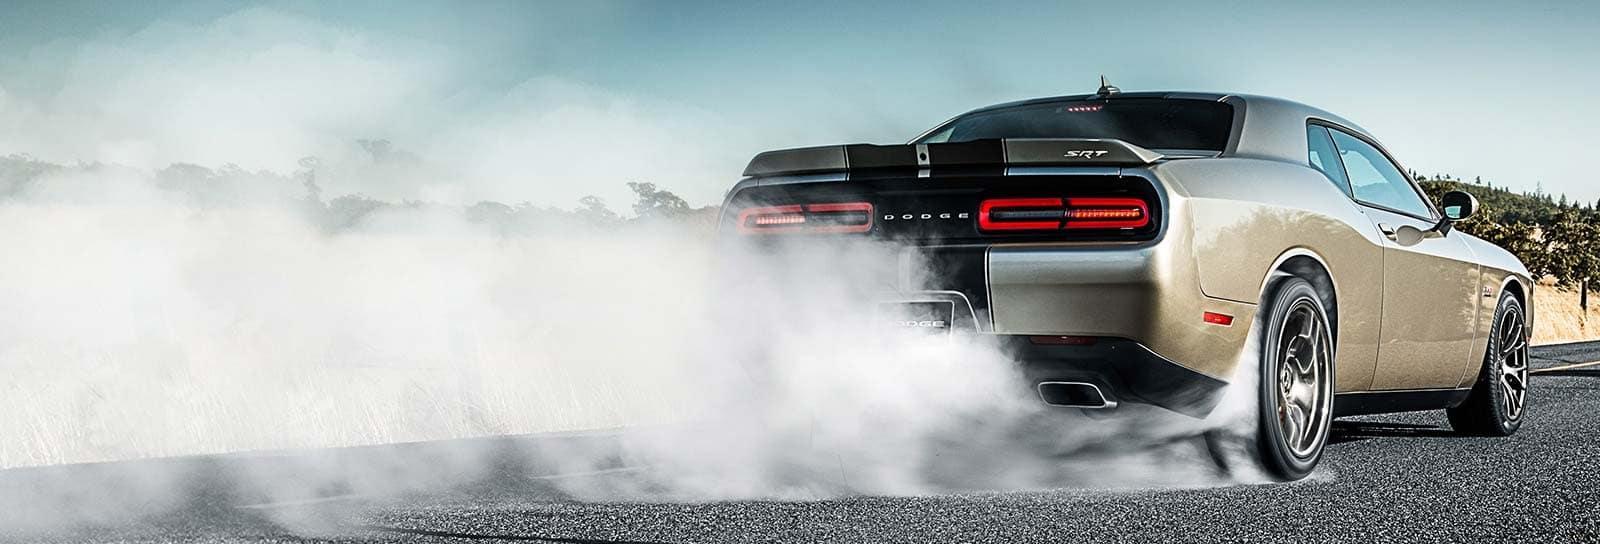 2016 dodge challenger vlp performance horsepower torque - Dodge Challenger 2015 Srt8